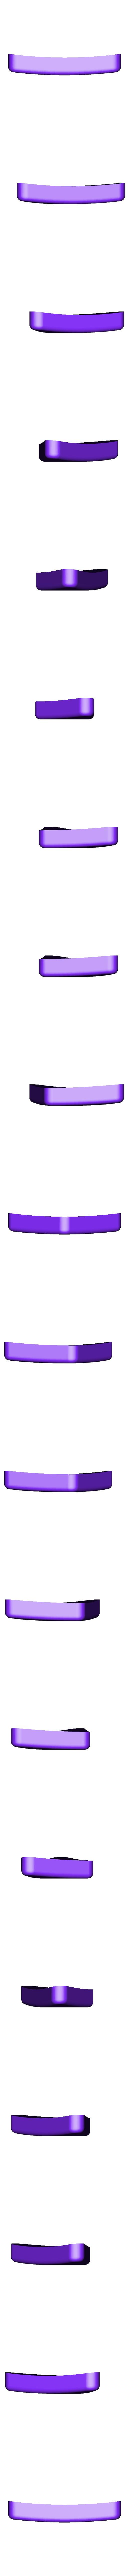 Triangle.stl Download free STL file Super Smash Brothers Amiibo Capsule • Template to 3D print, Make-Do